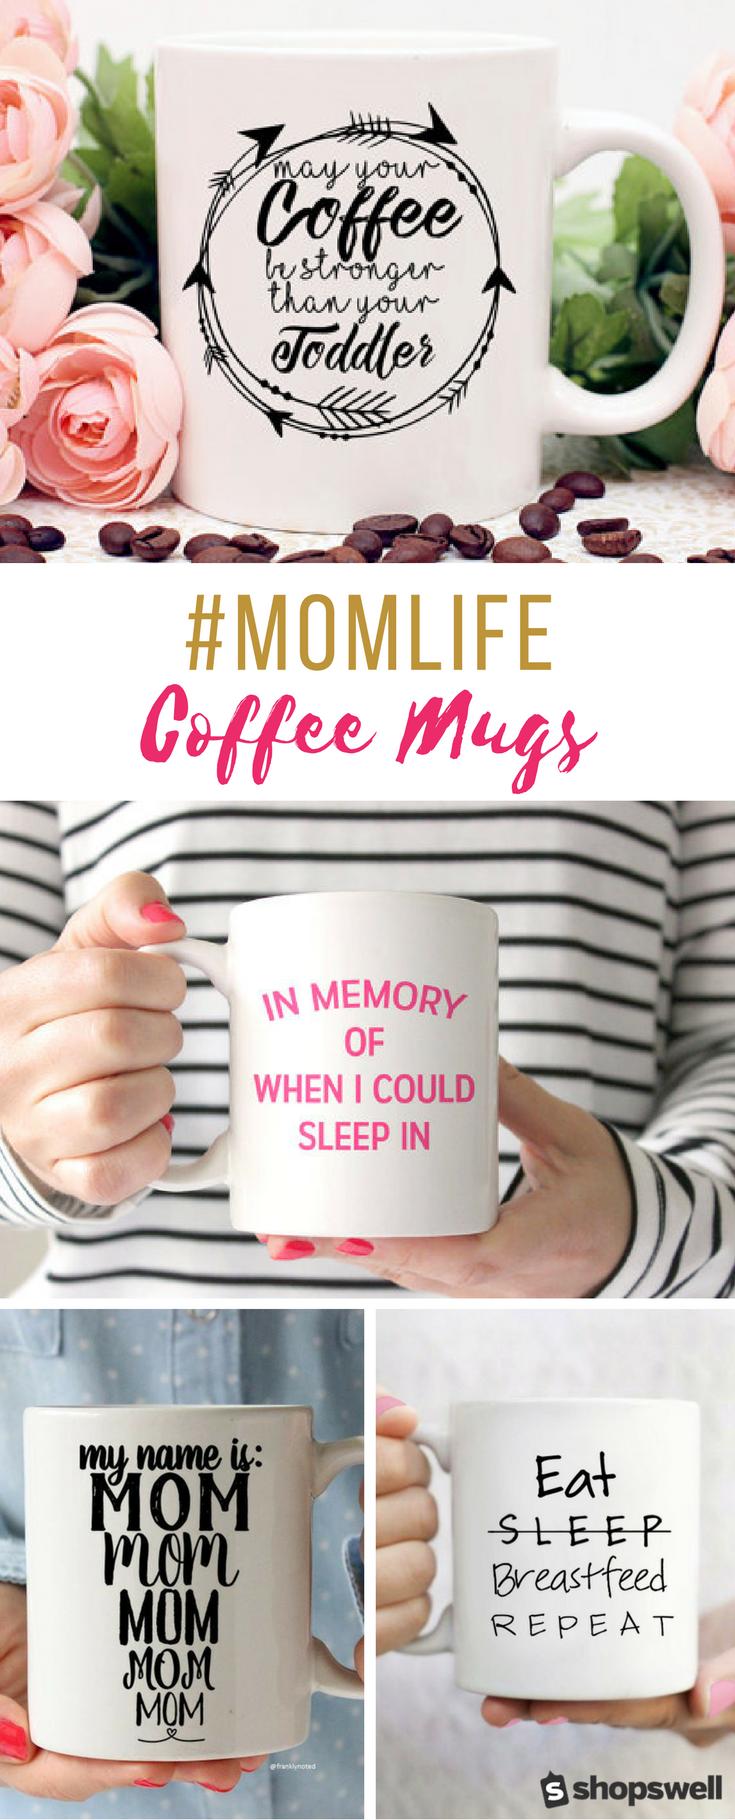 Cricut Coffee Mug Ideas : cricut, coffee, ideas, Coffee, Everywhere, Totally, Understand, Shopswell, Mugs,, Cricut, Crafts